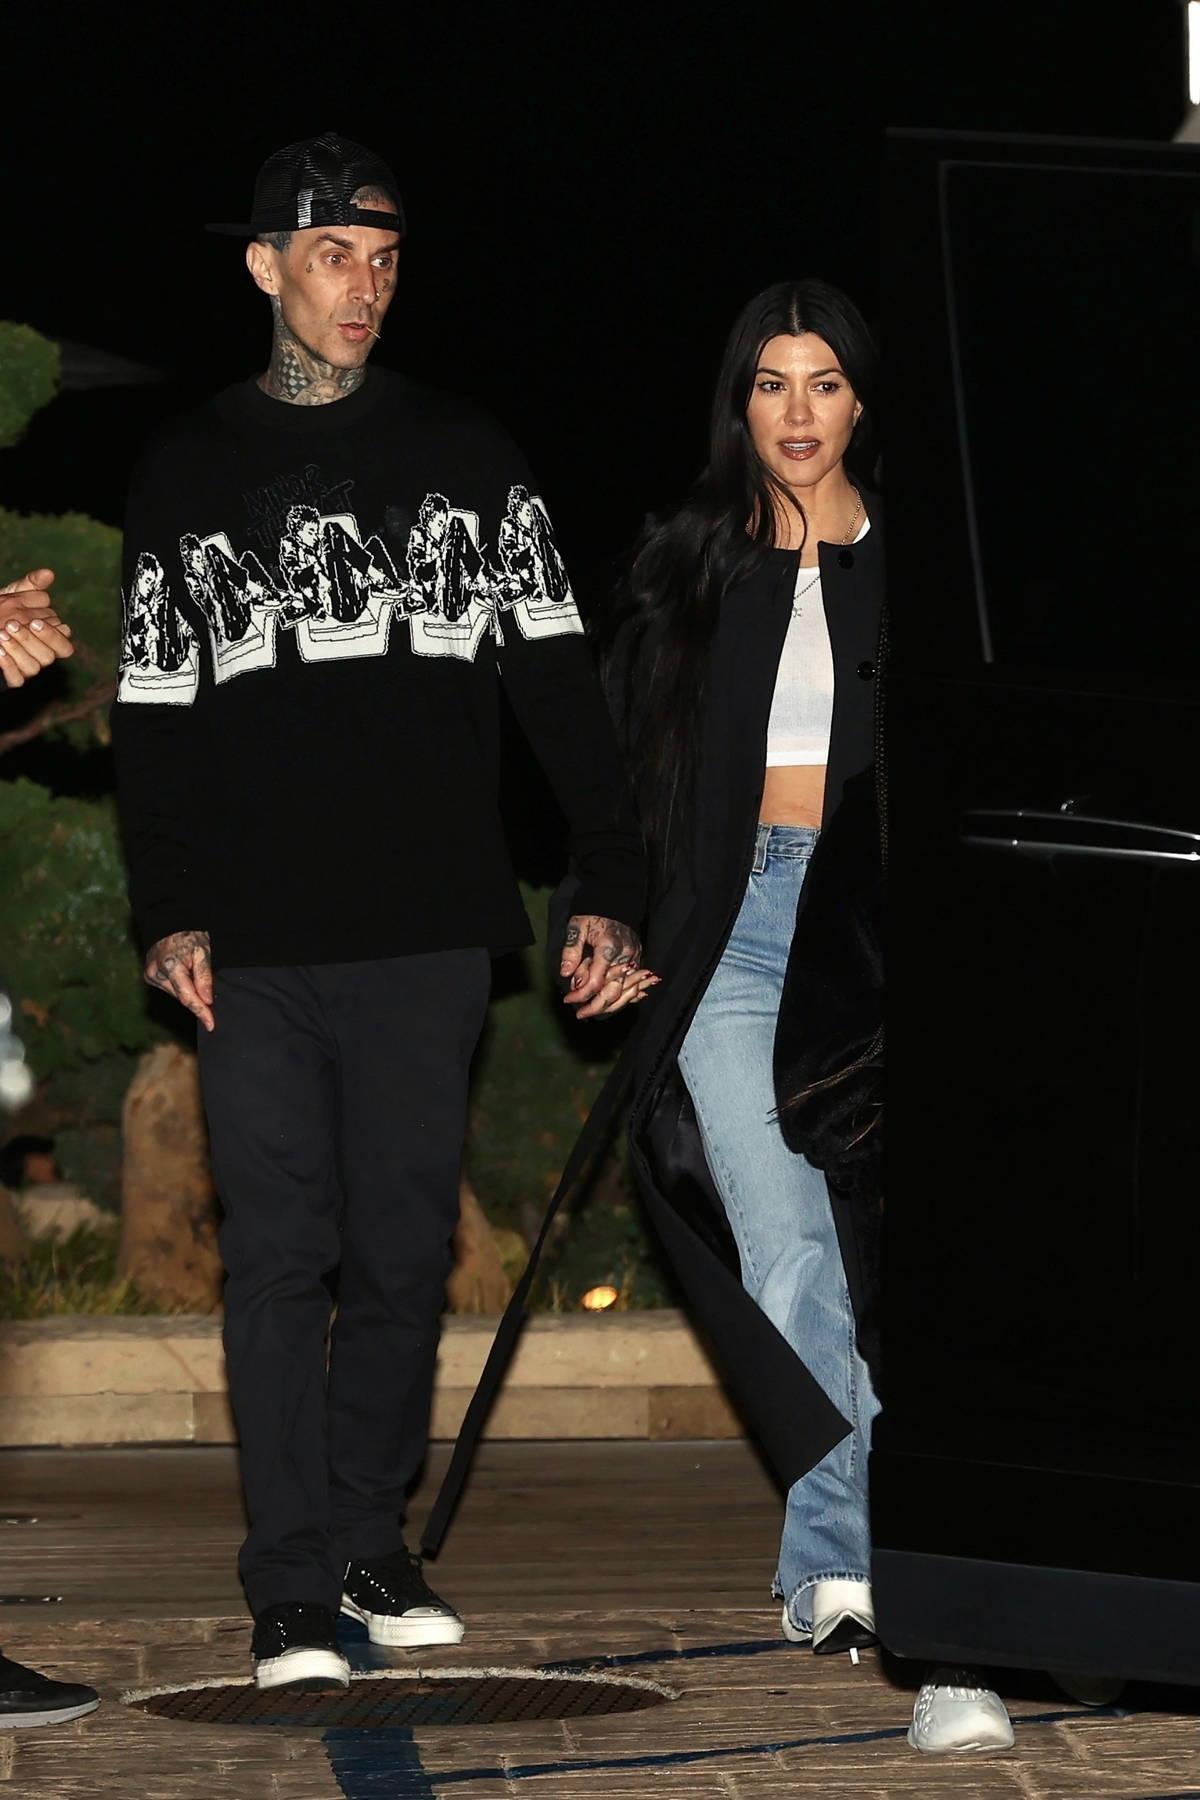 Kourtney Kardashian and Travis Barker bring Kourtney's daughter Penelope and Kim's daughter North to dinner in Malibu, California